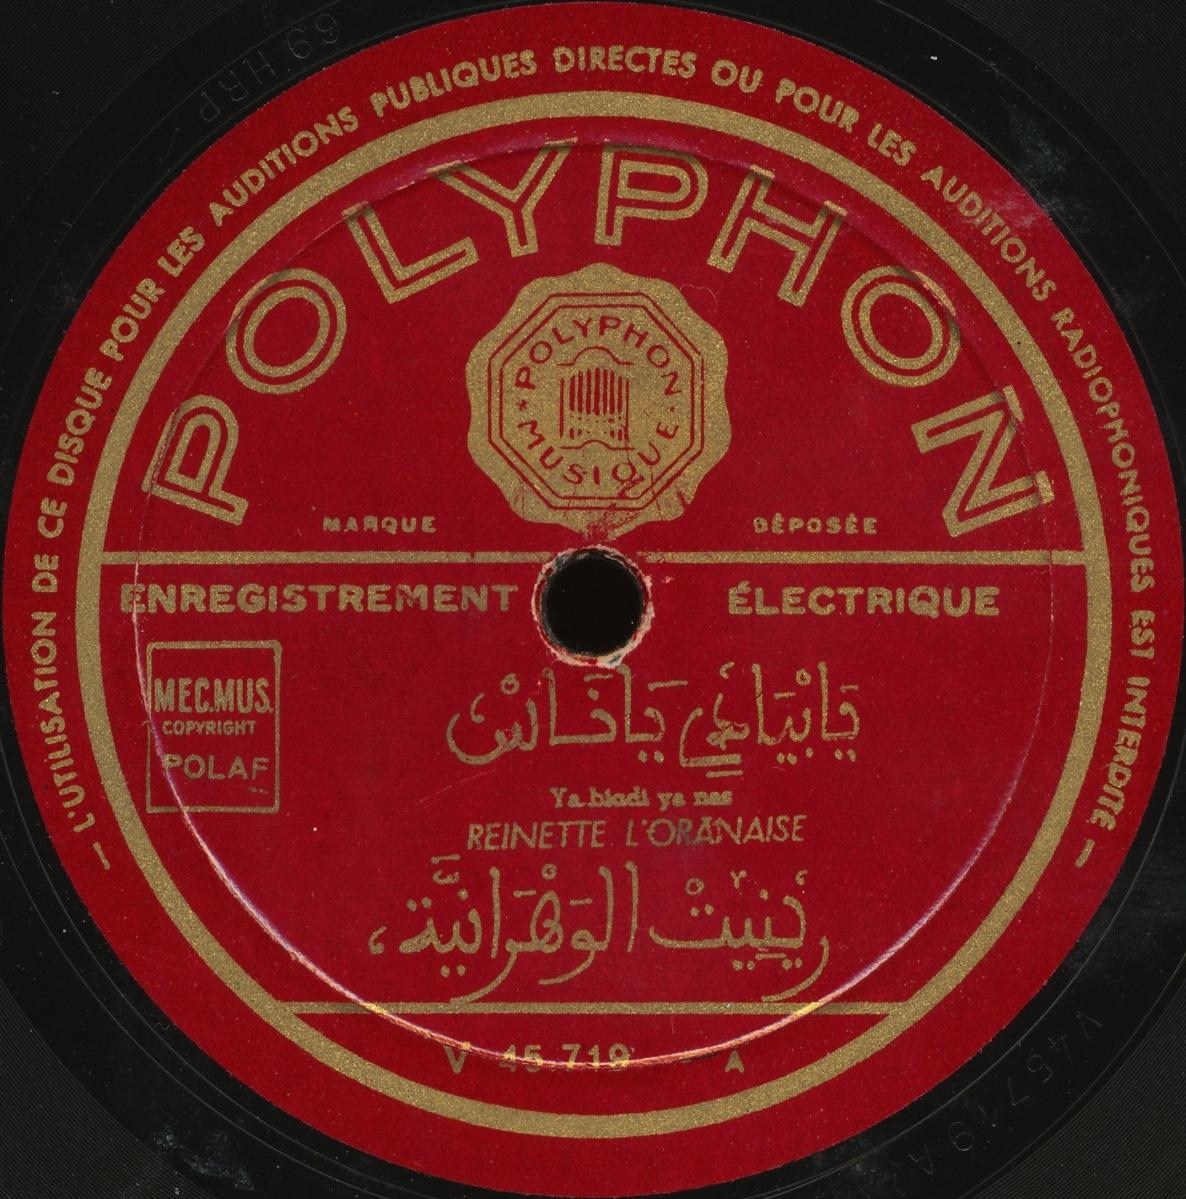 Reinette l'Oranaise – Ya biadi ya nas – Polyphon, c. 1934